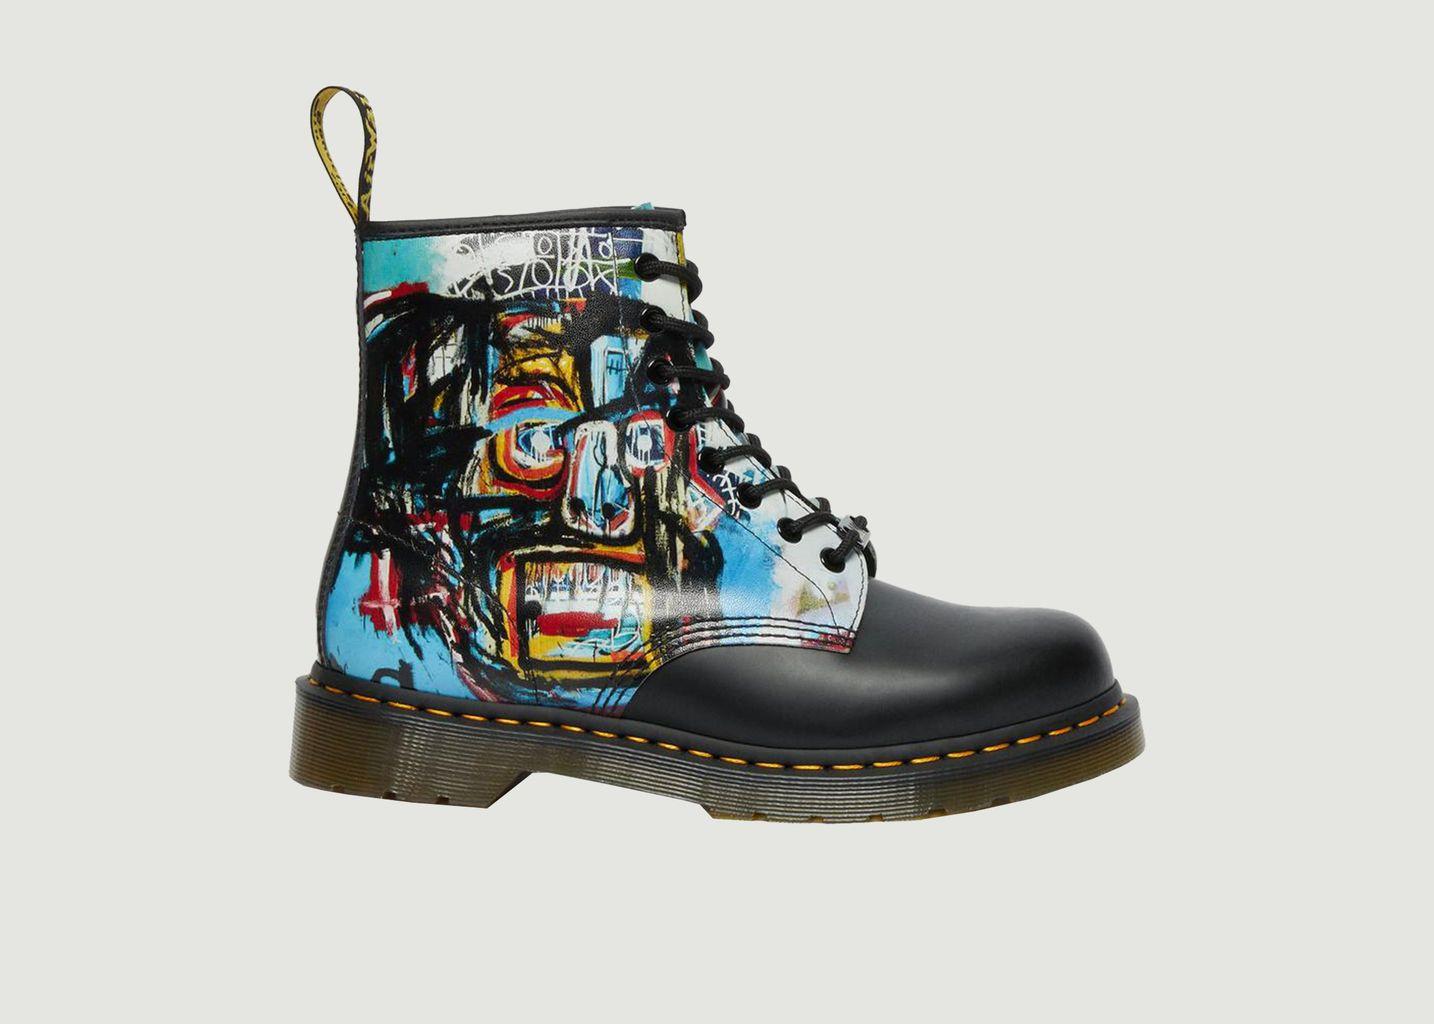 Bottes 1460 Basquiat en cuir  - Dr. Martens